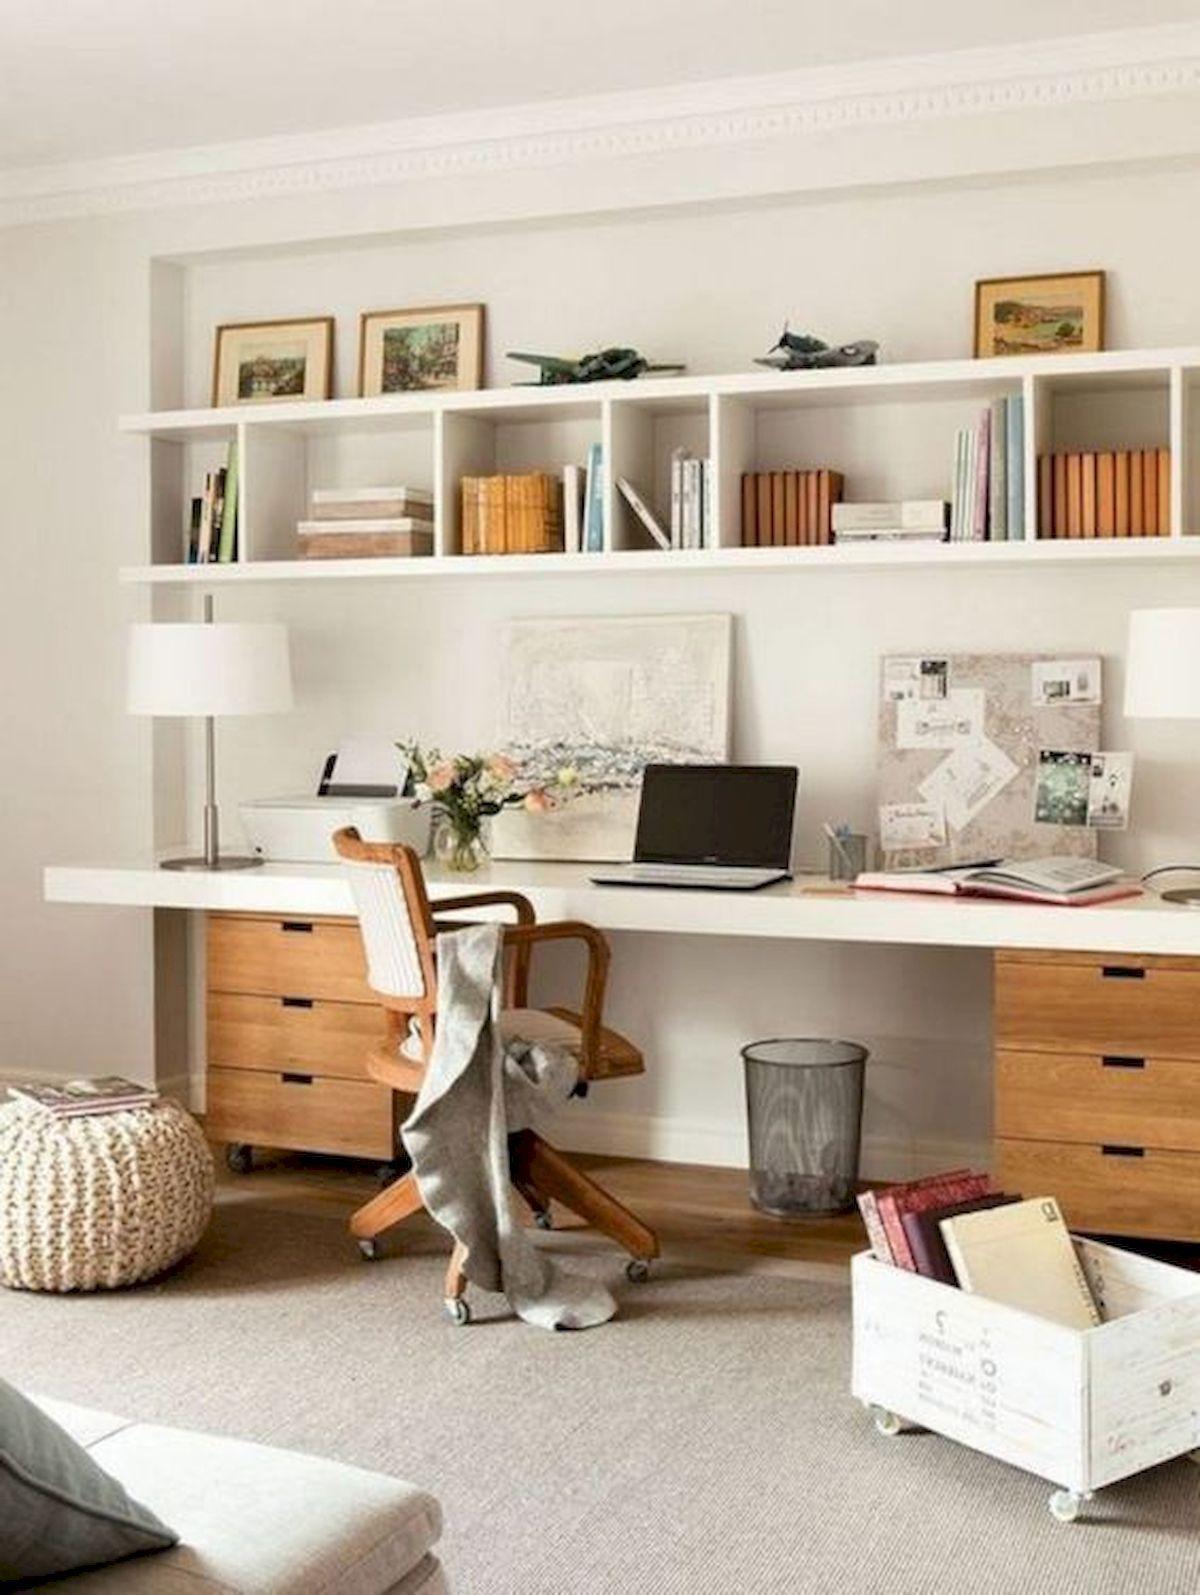 55 Incredible Diy Office Desk Design Ideas And Decor Googodecor Office Interior Design Office Desk Designs Home Office Decor